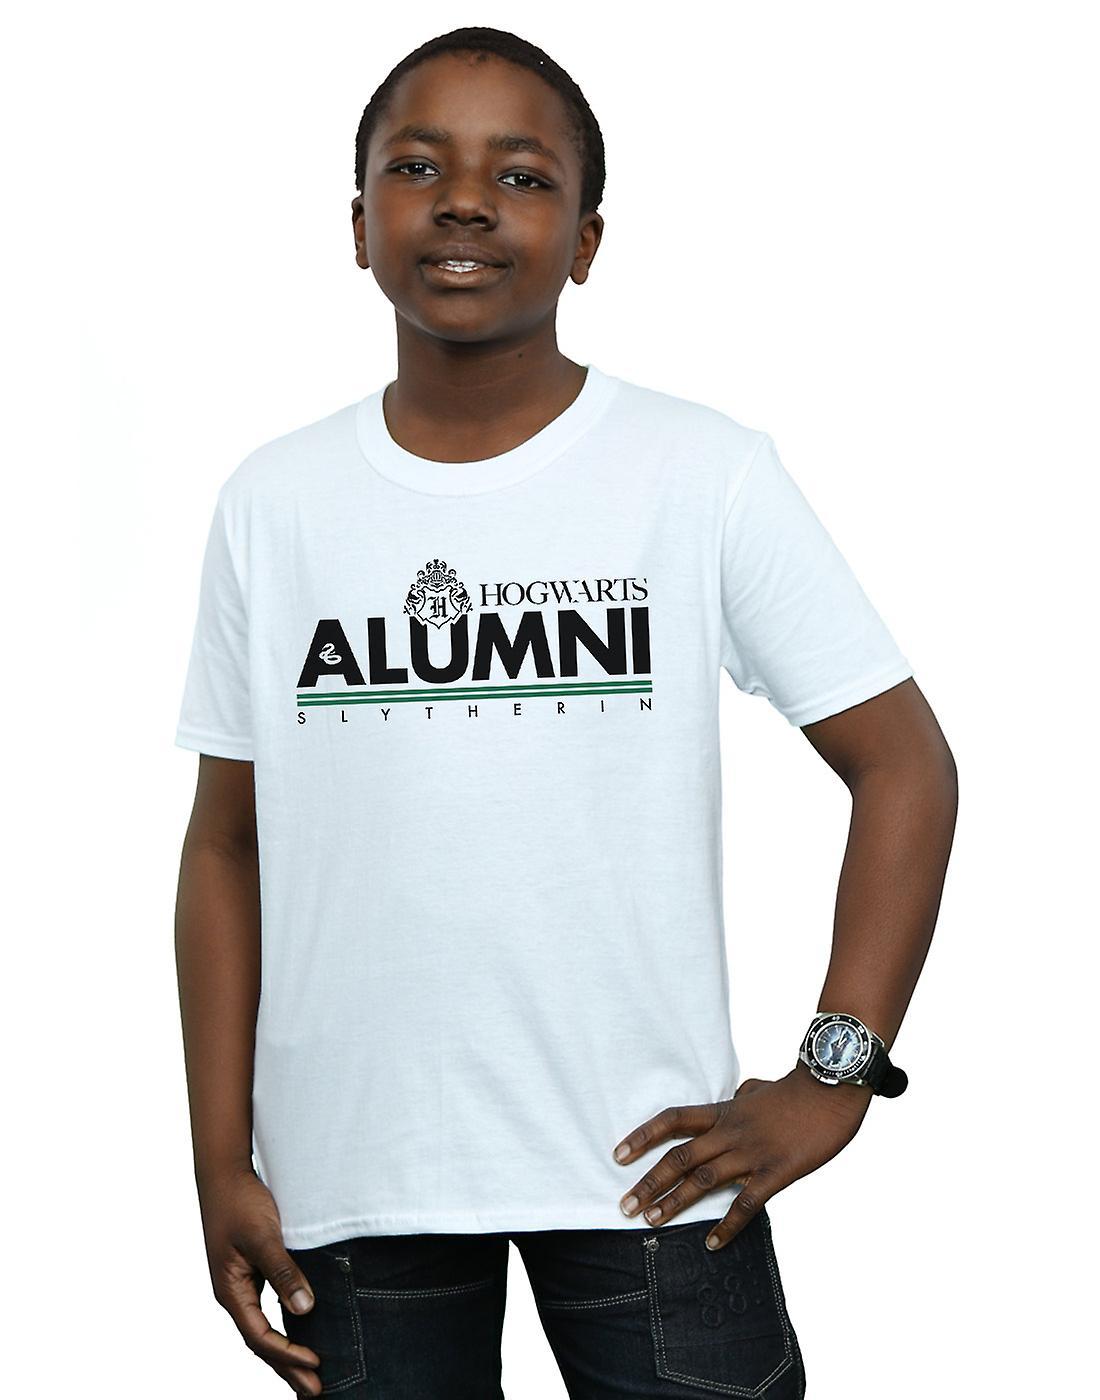 Harry Potter Boys Hogwarts Alumni Slytherin T-Shirt